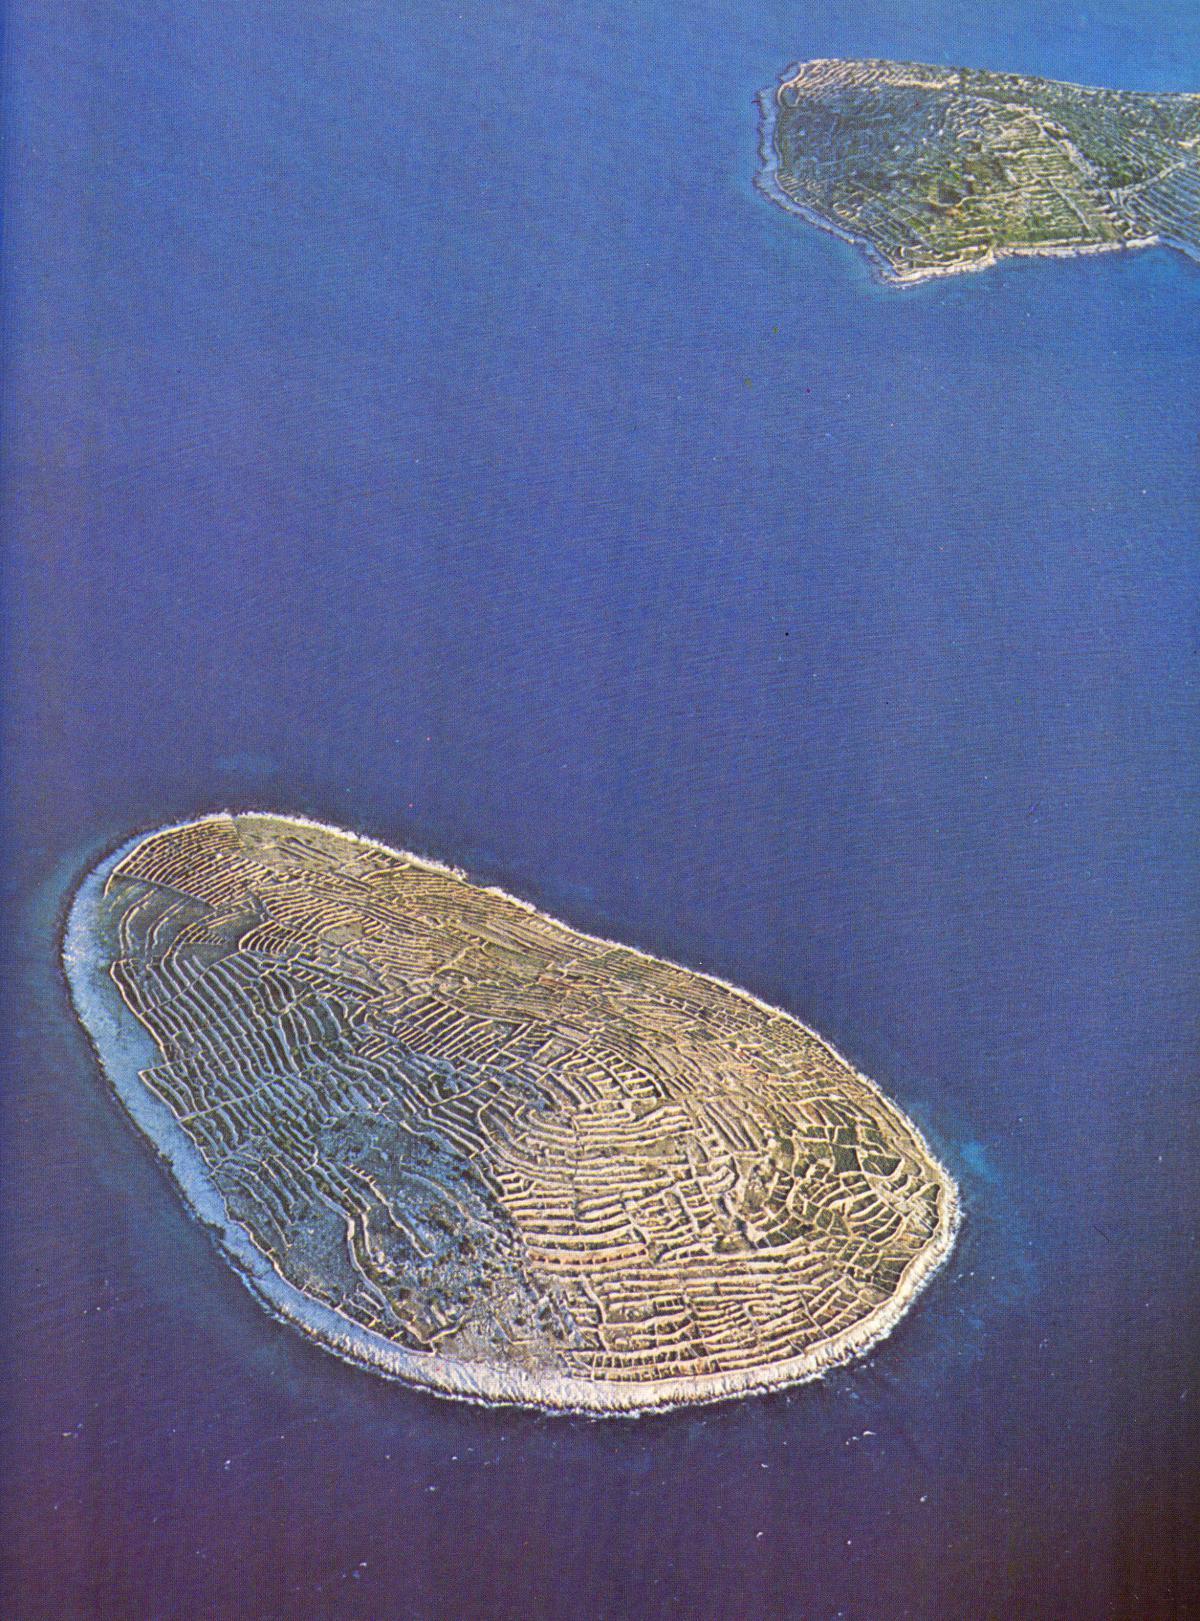 baljenac-island-jadran-kale-hanza-media-3